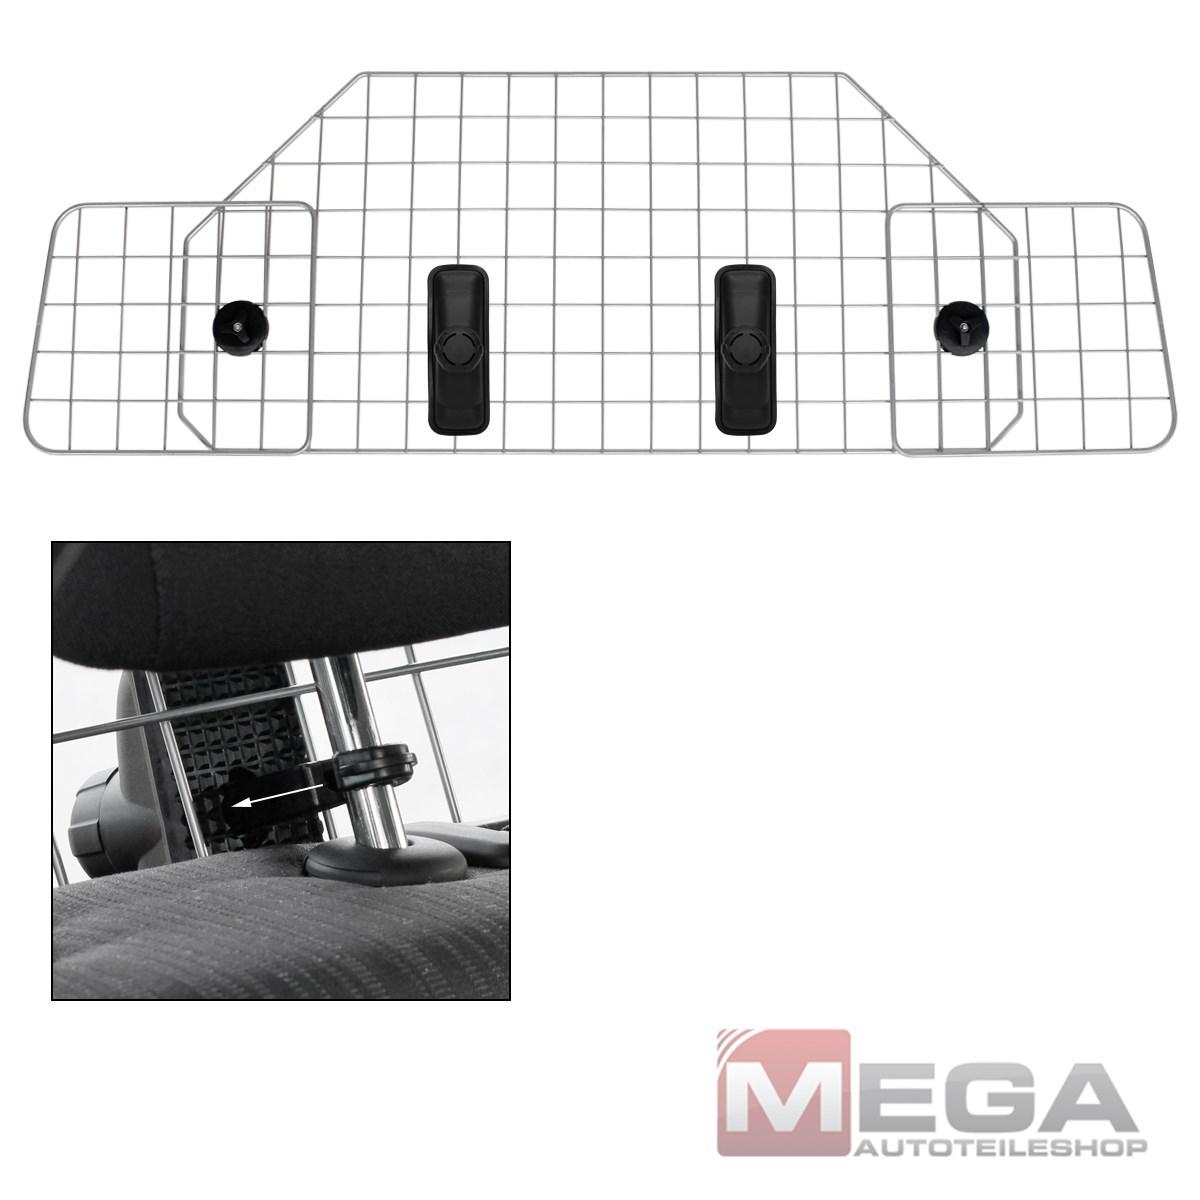 schutzgitter auto hundegitter hundeschutzgitter. Black Bedroom Furniture Sets. Home Design Ideas